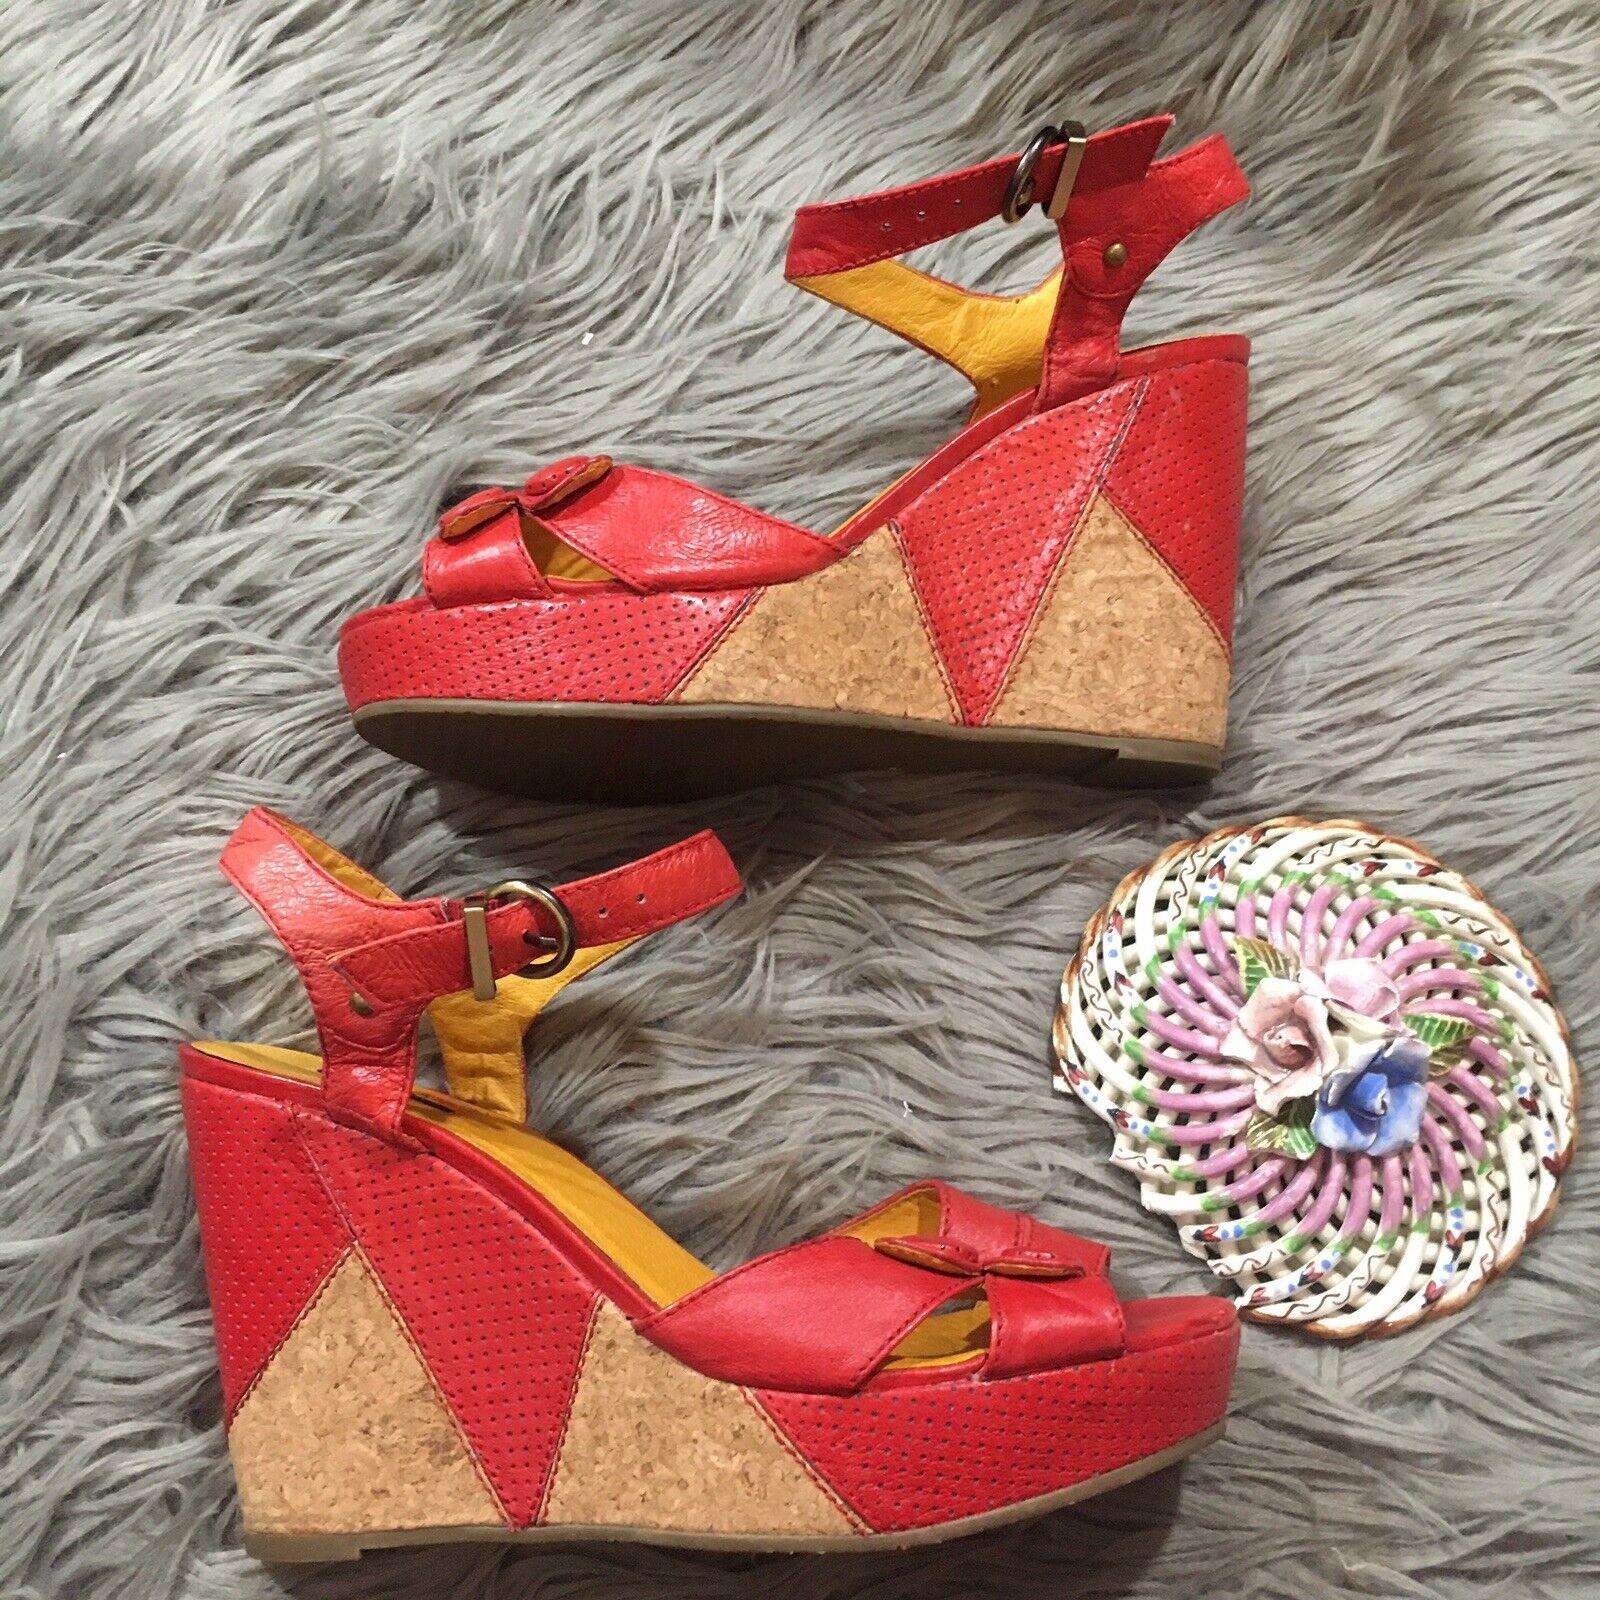 Miz Mooz Platform Wedge Sandals Red Leather Size 10 Lyla Cork Style